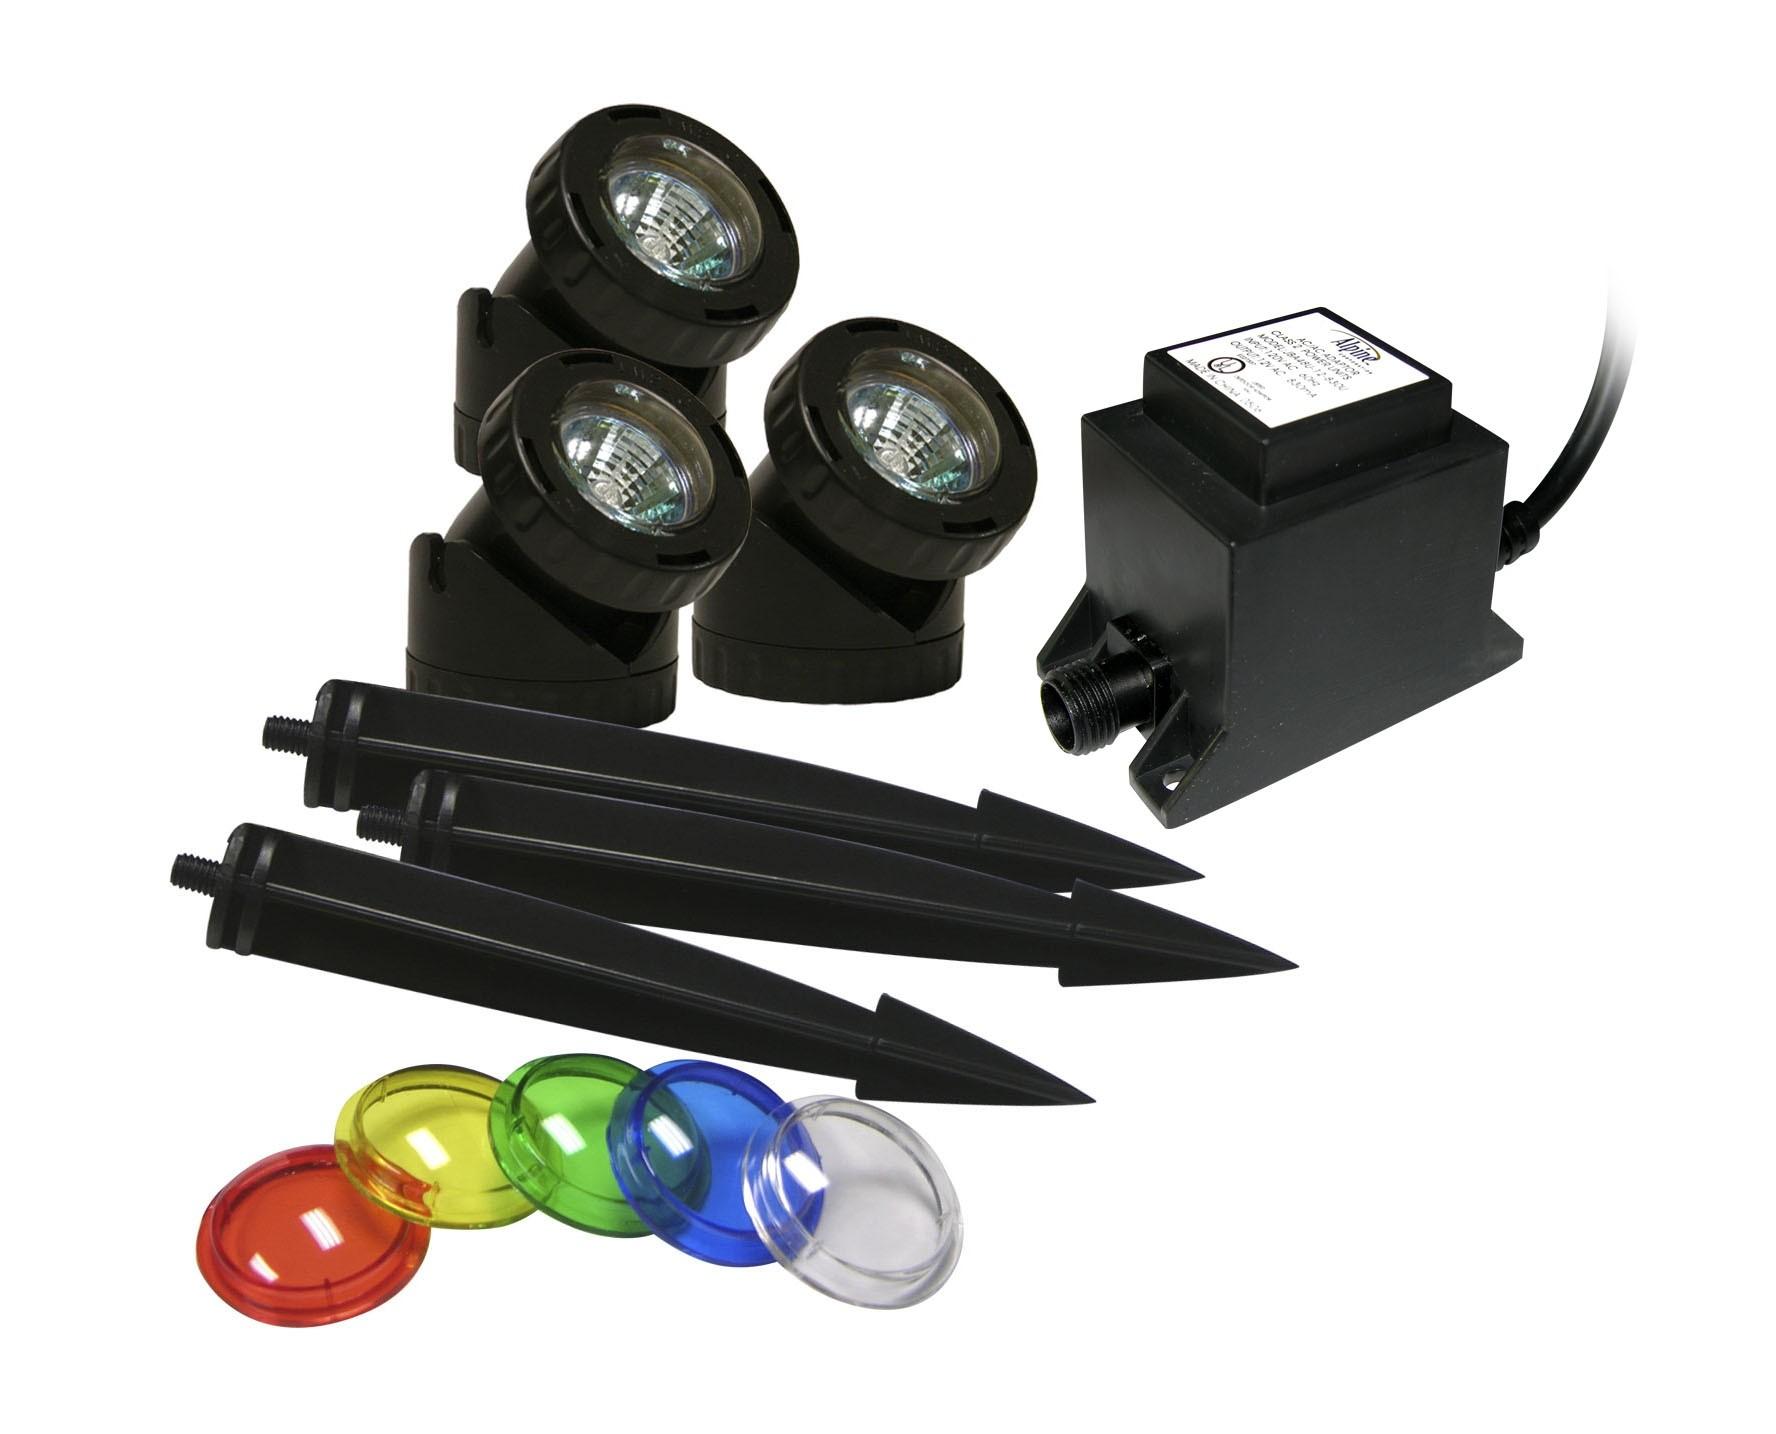 Set of 3 Powerbeam 10W Lights w/ Transformer